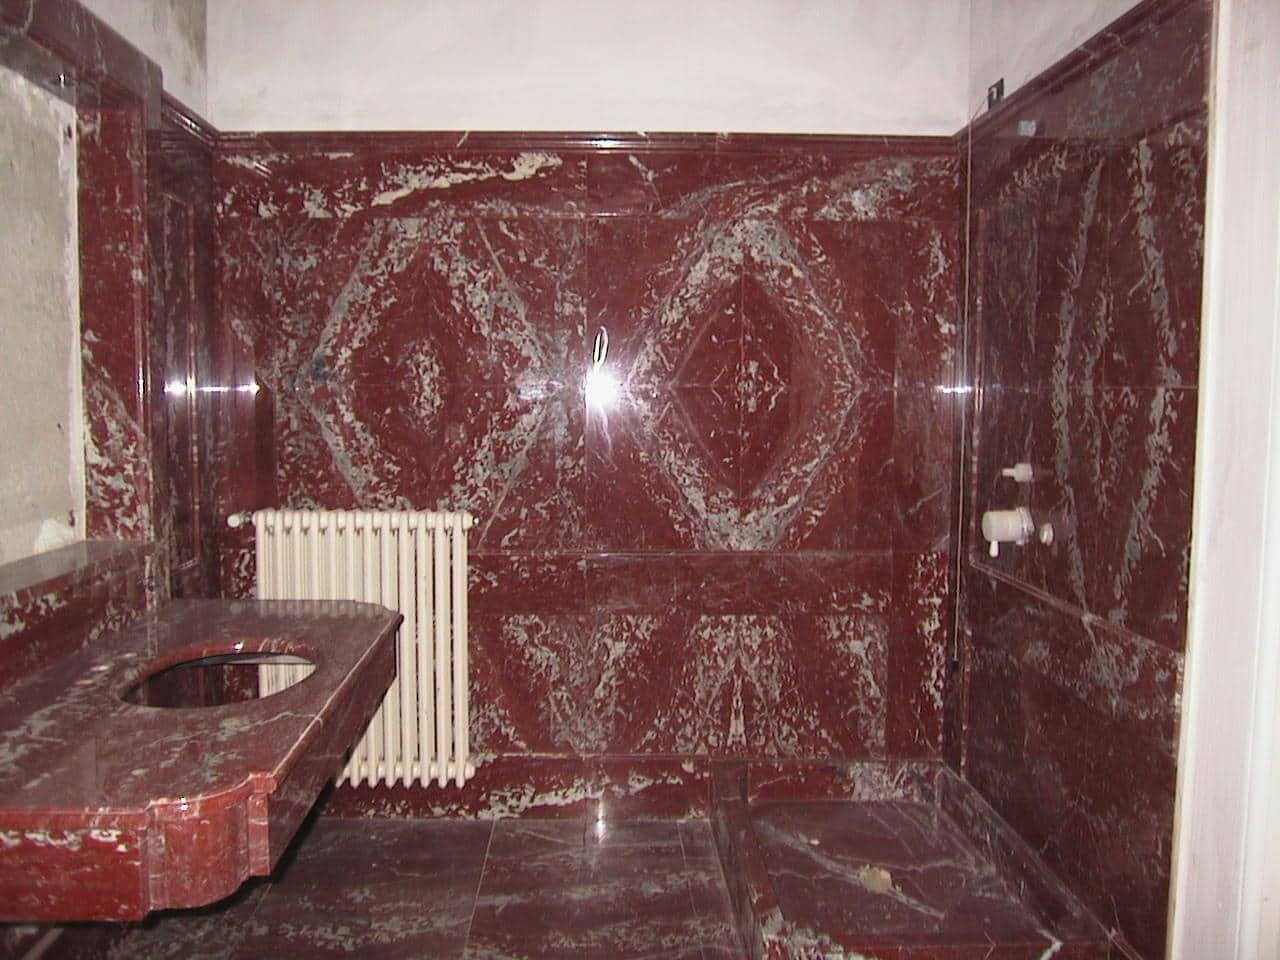 Marmo rosso francia marmo - Rivestimento bagno marmo ...